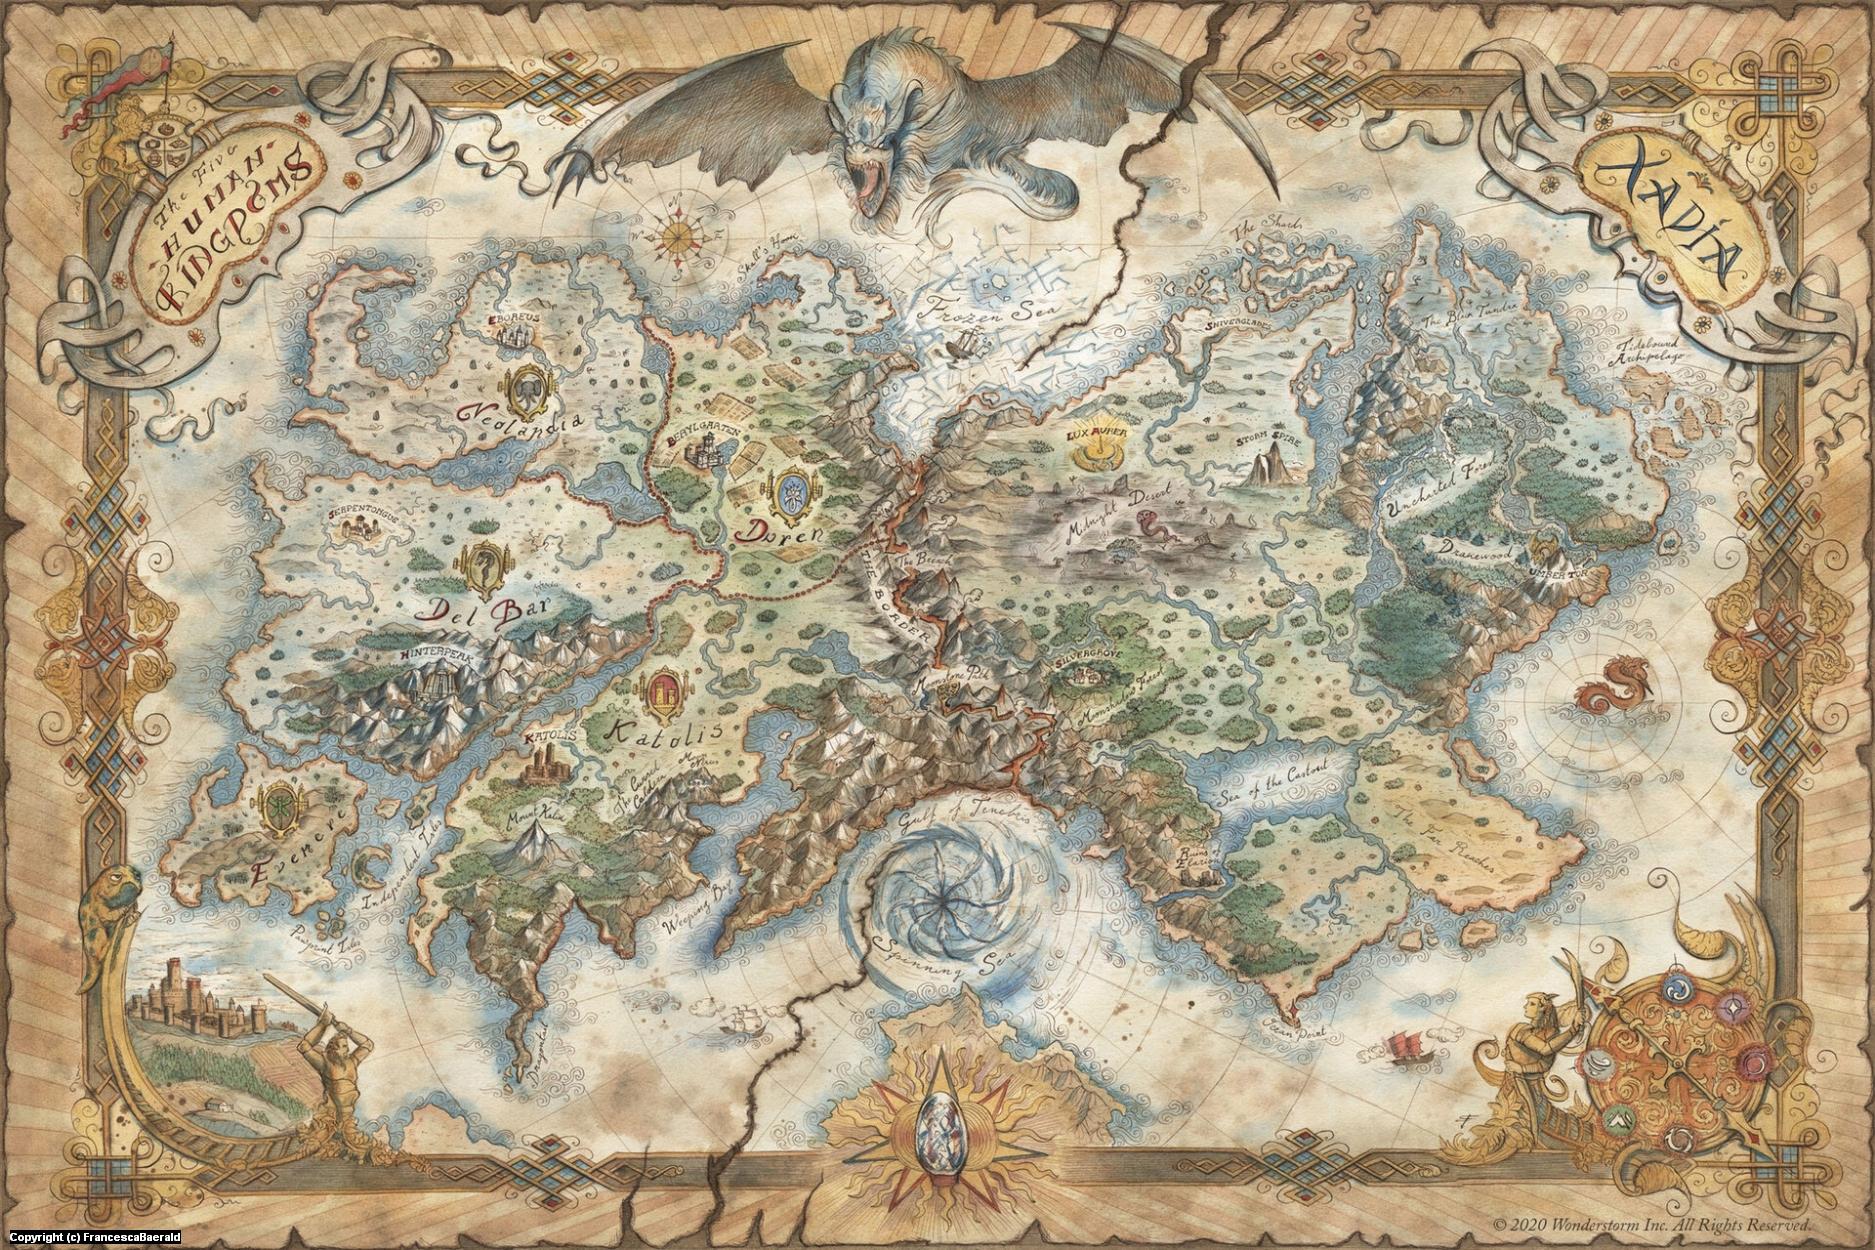 Map of Xadia - The Dragon Prince Artwork by Francesca Baerald